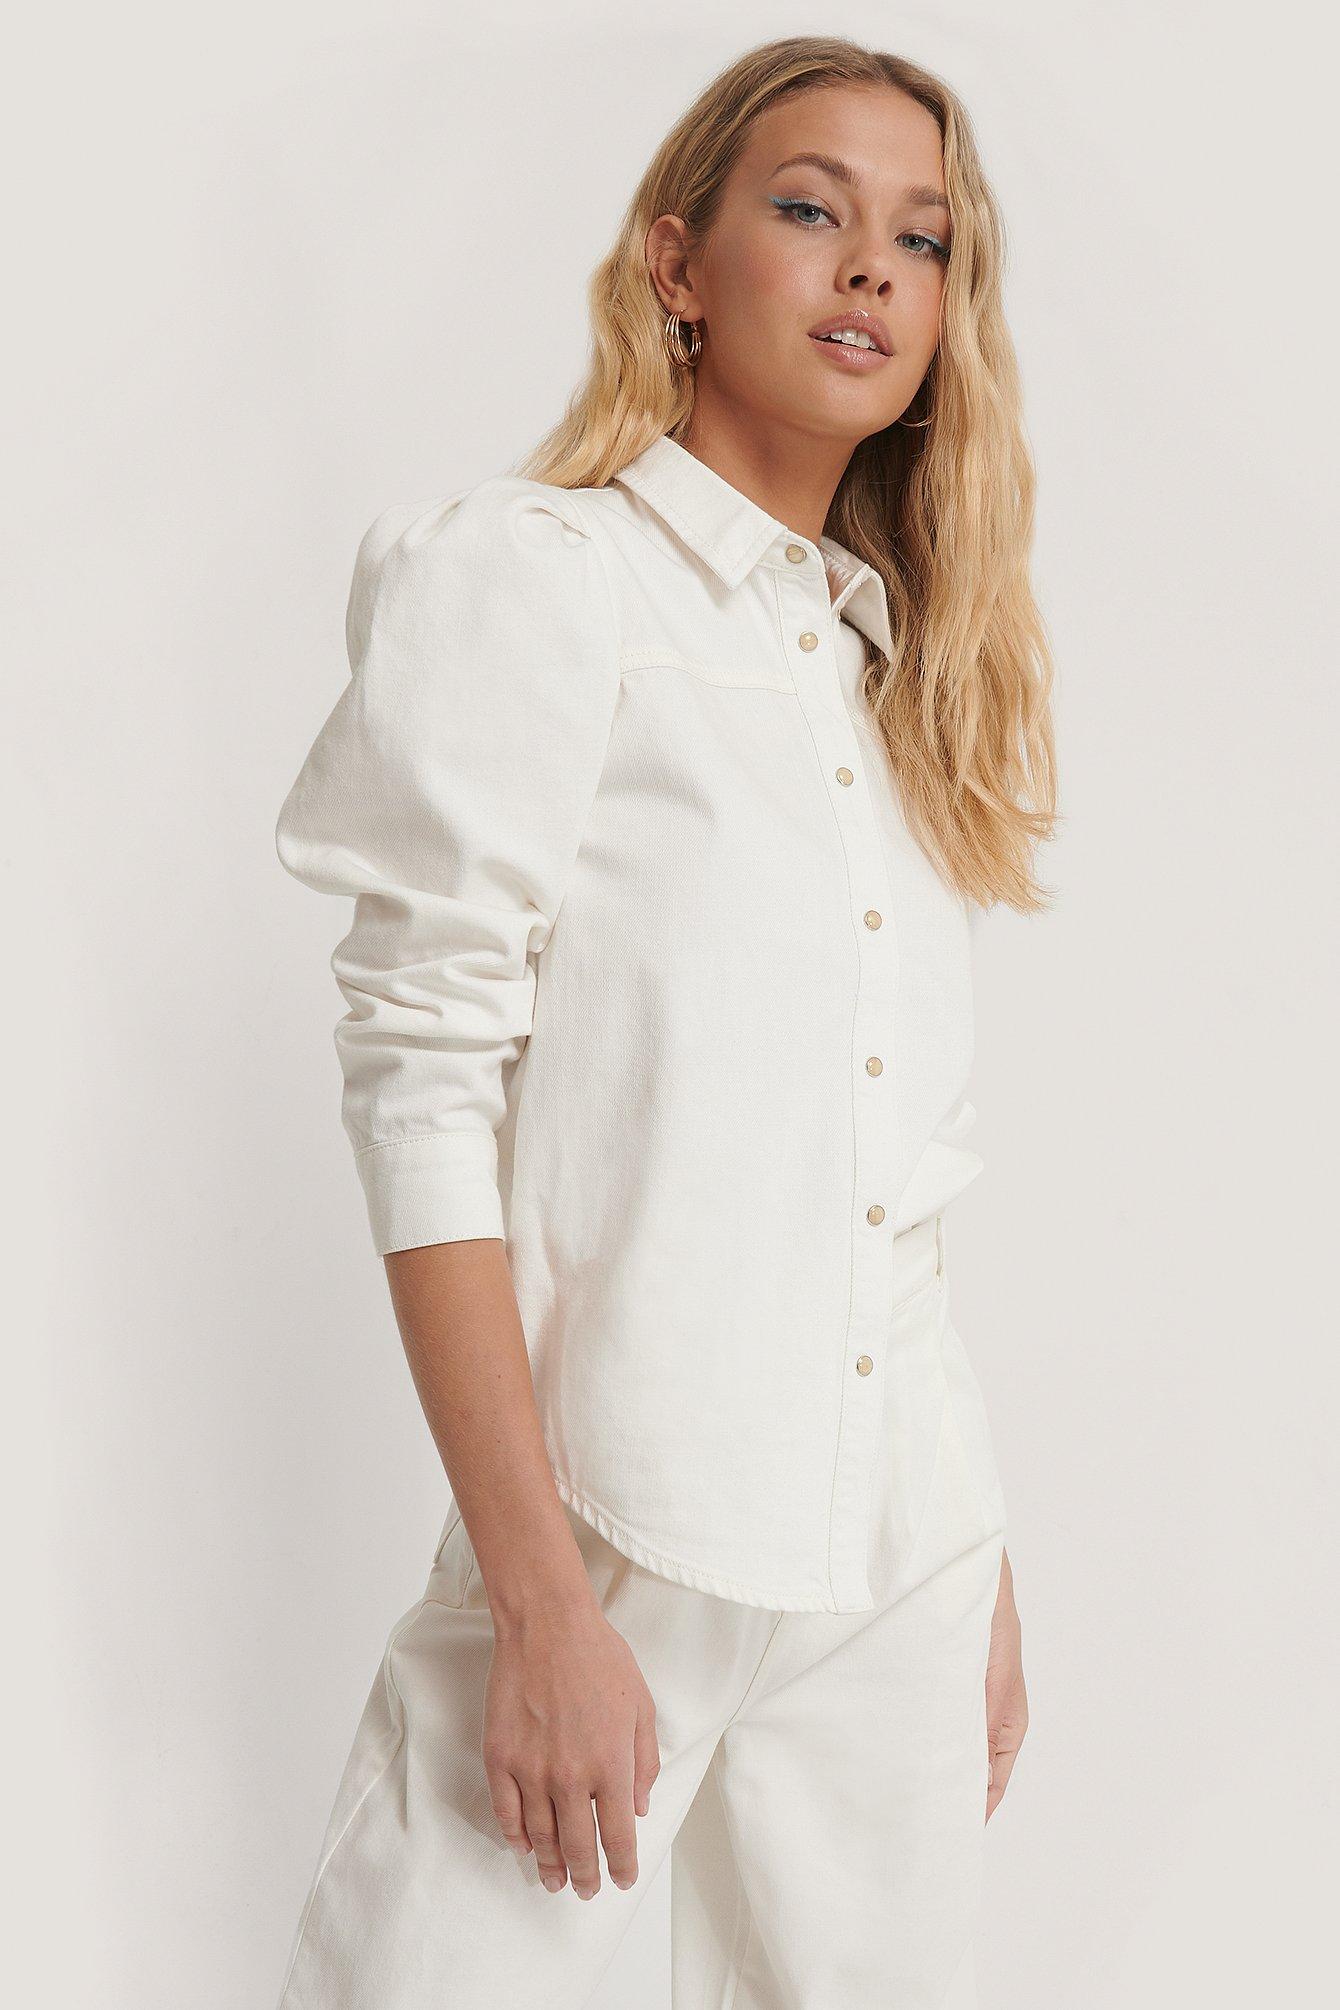 Annais x NA-KD Jeansbluse Mit Puffärmeln - White   Bekleidung > Blusen > Jeansblusen   Annais x NA-KD